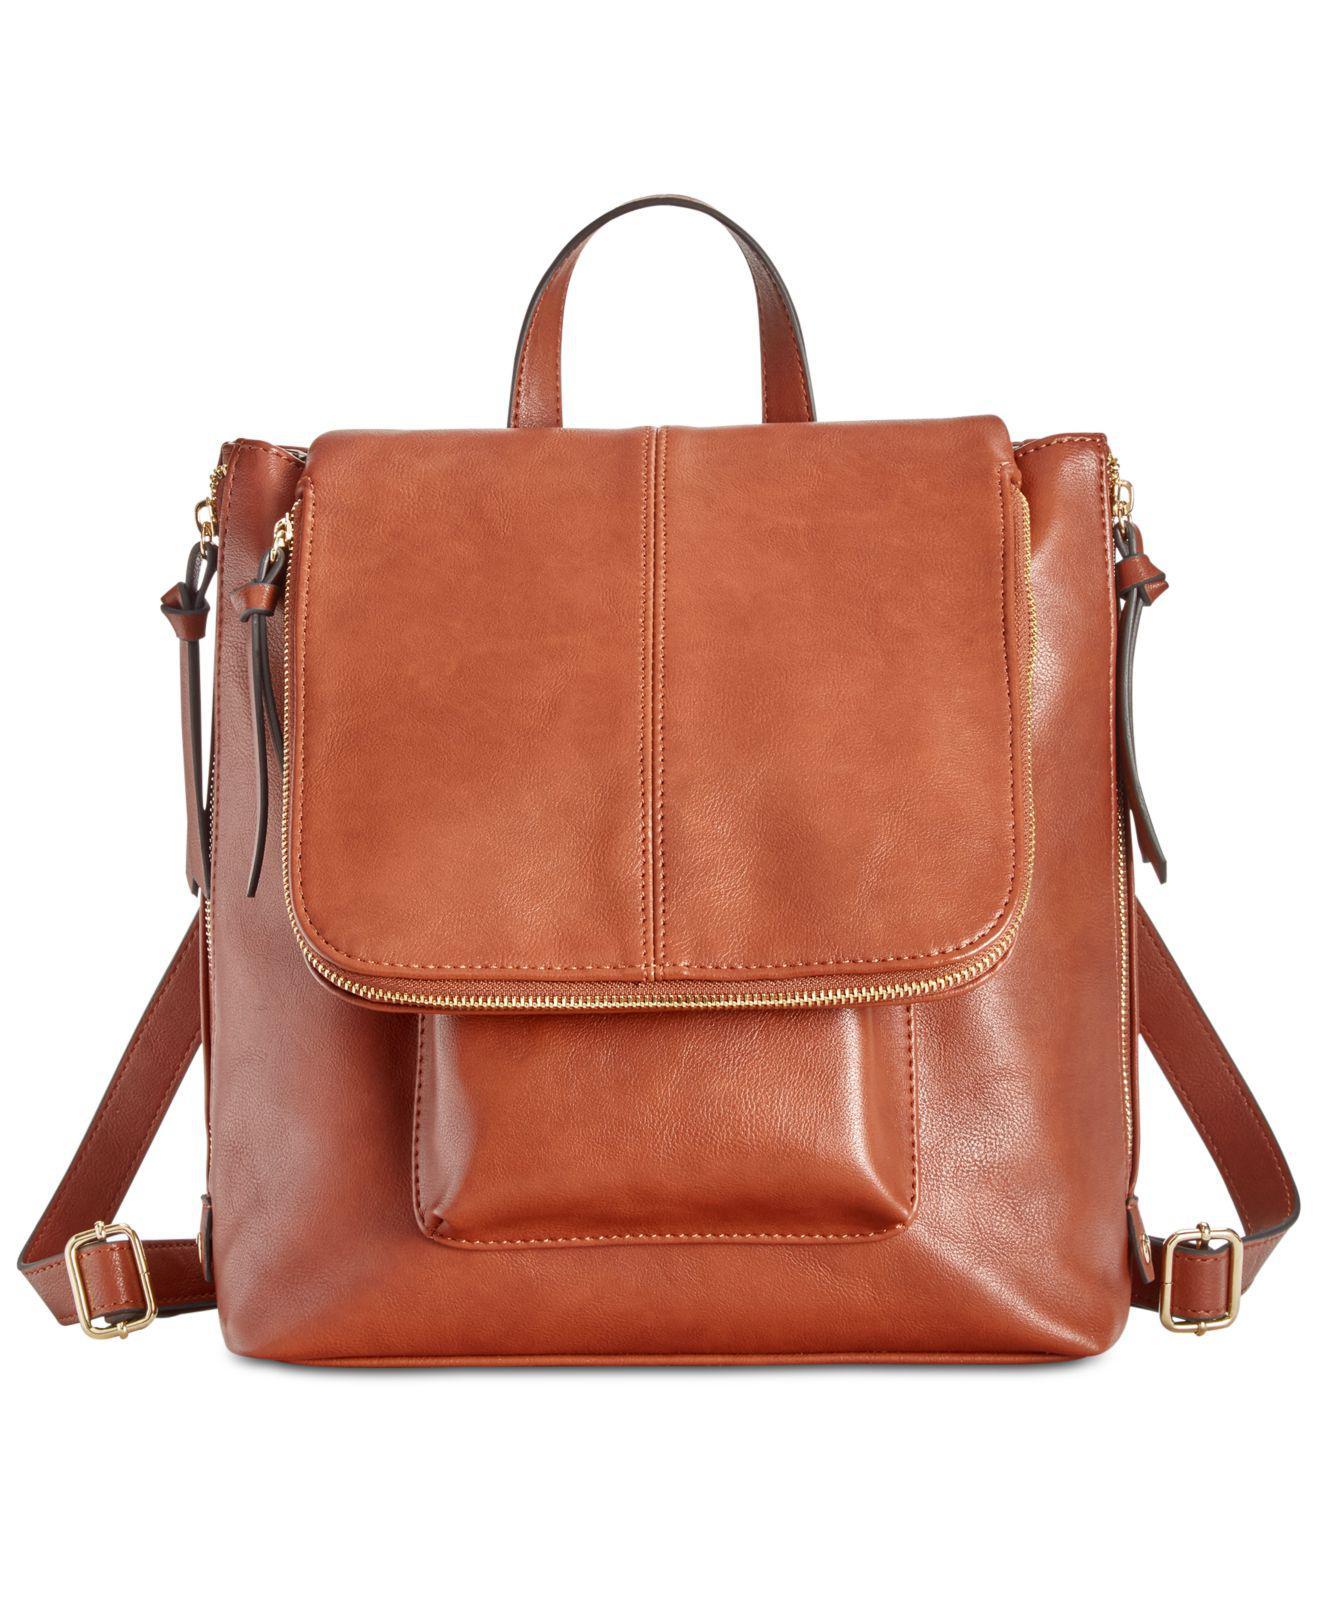 Lyst - INC International Concepts I.n.c. Elliah Convertible Backpack ... 6a9c167948c5b